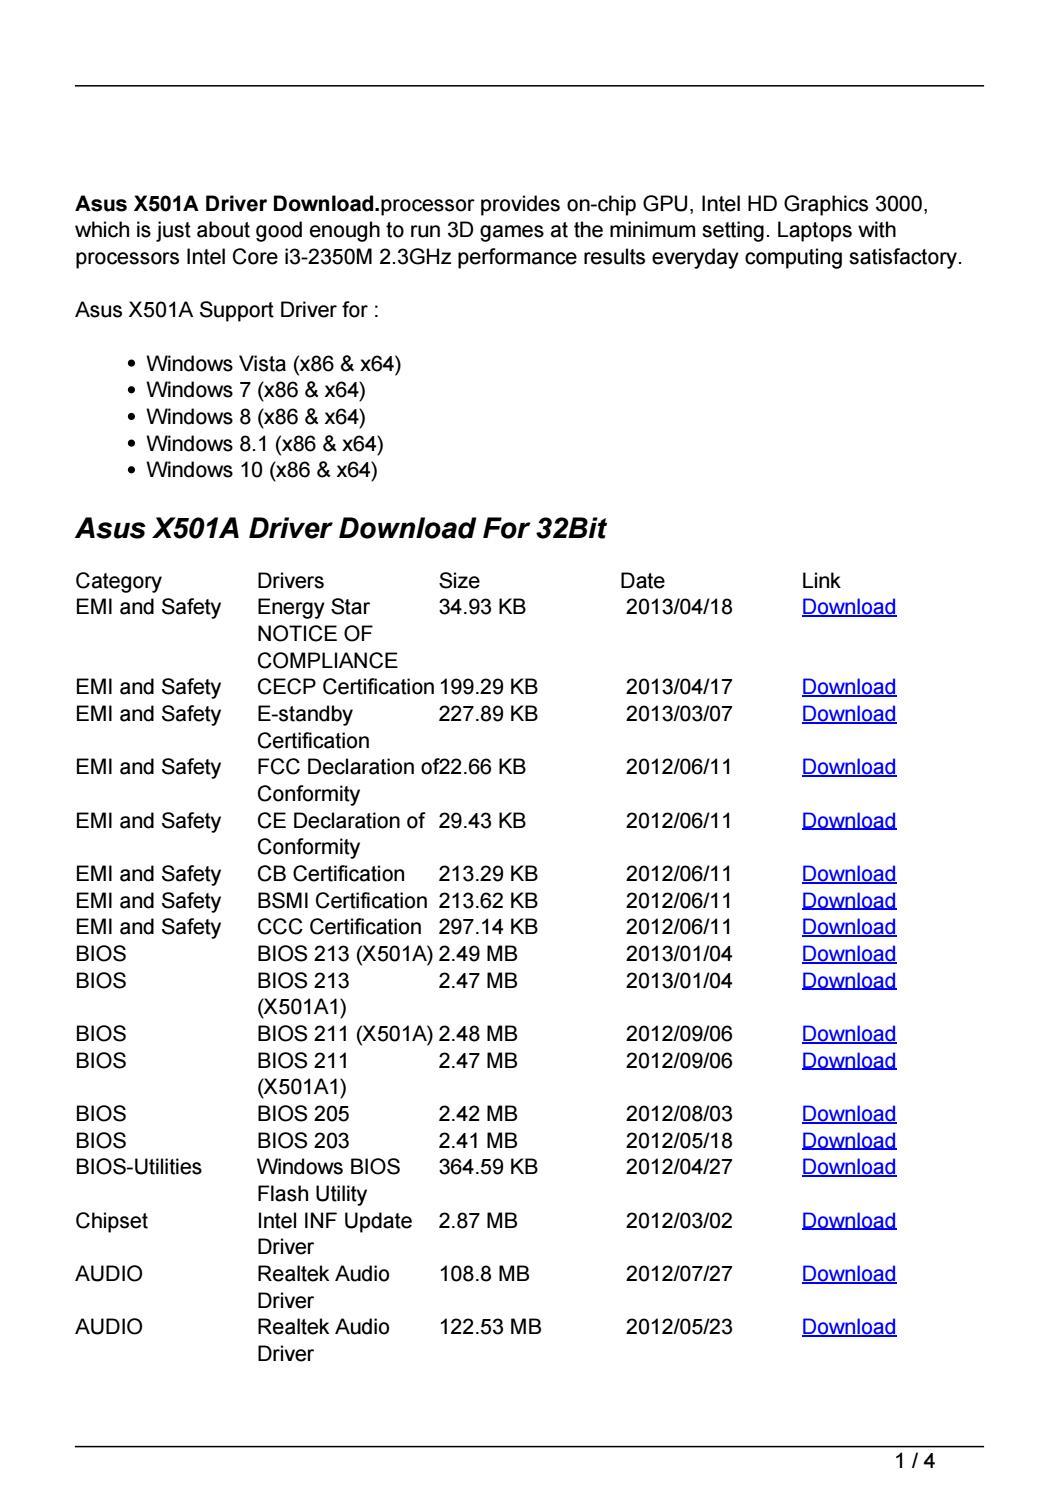 Asus X501A Notebook Intel Rapid Storage Technology 64 BIT Driver